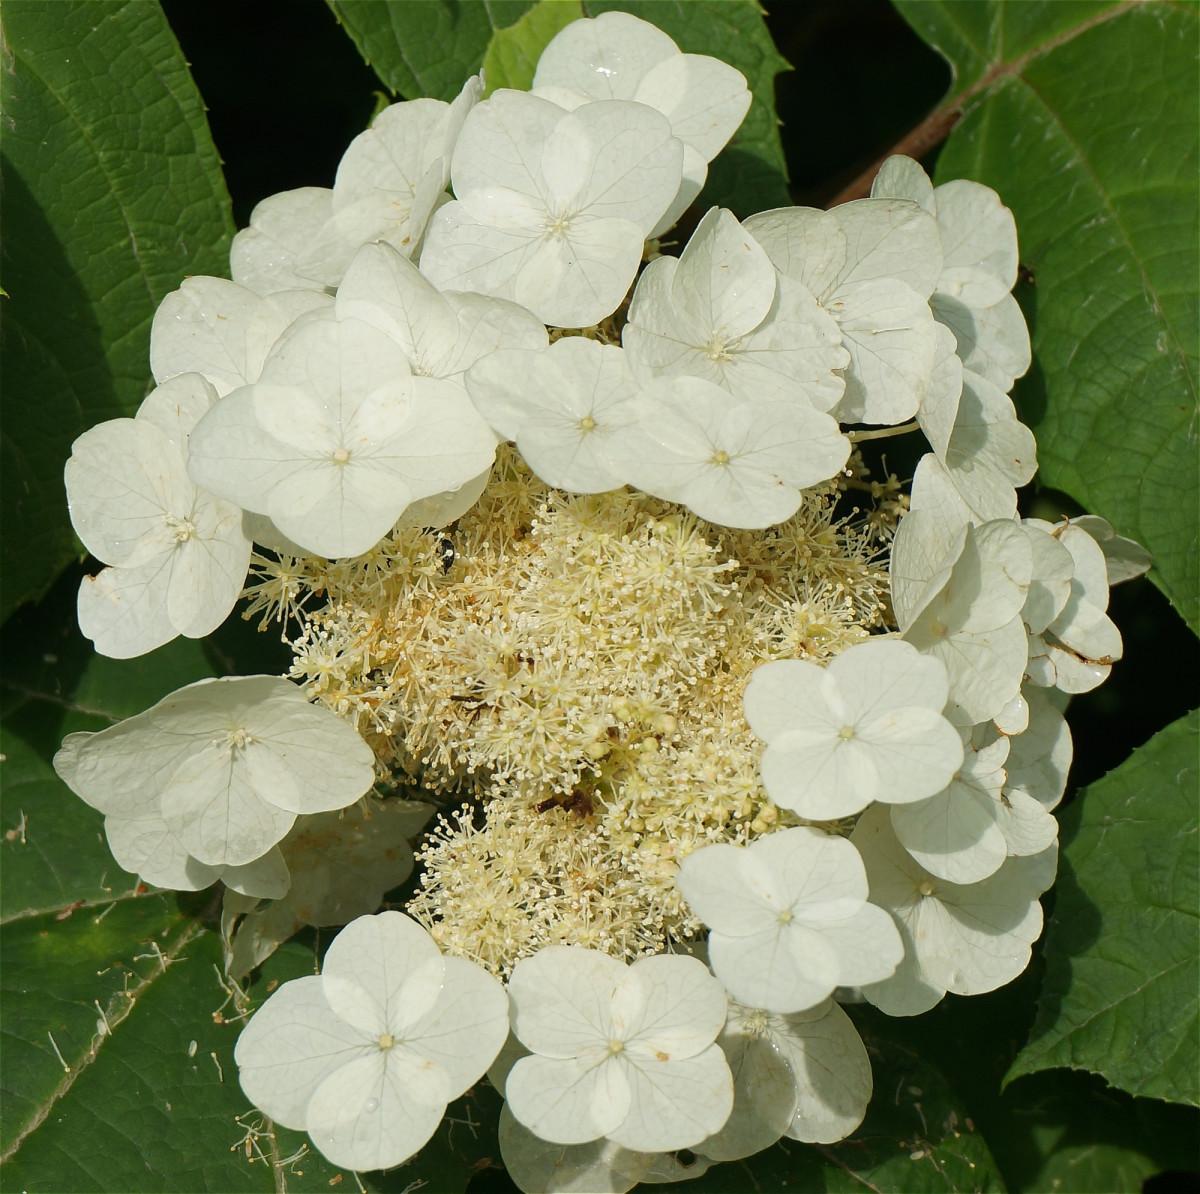 Welche Blumen Bl Hen Im September schneeball blume schneeball blume schneeball blume aussehen herkunft schneeball blume aussehen